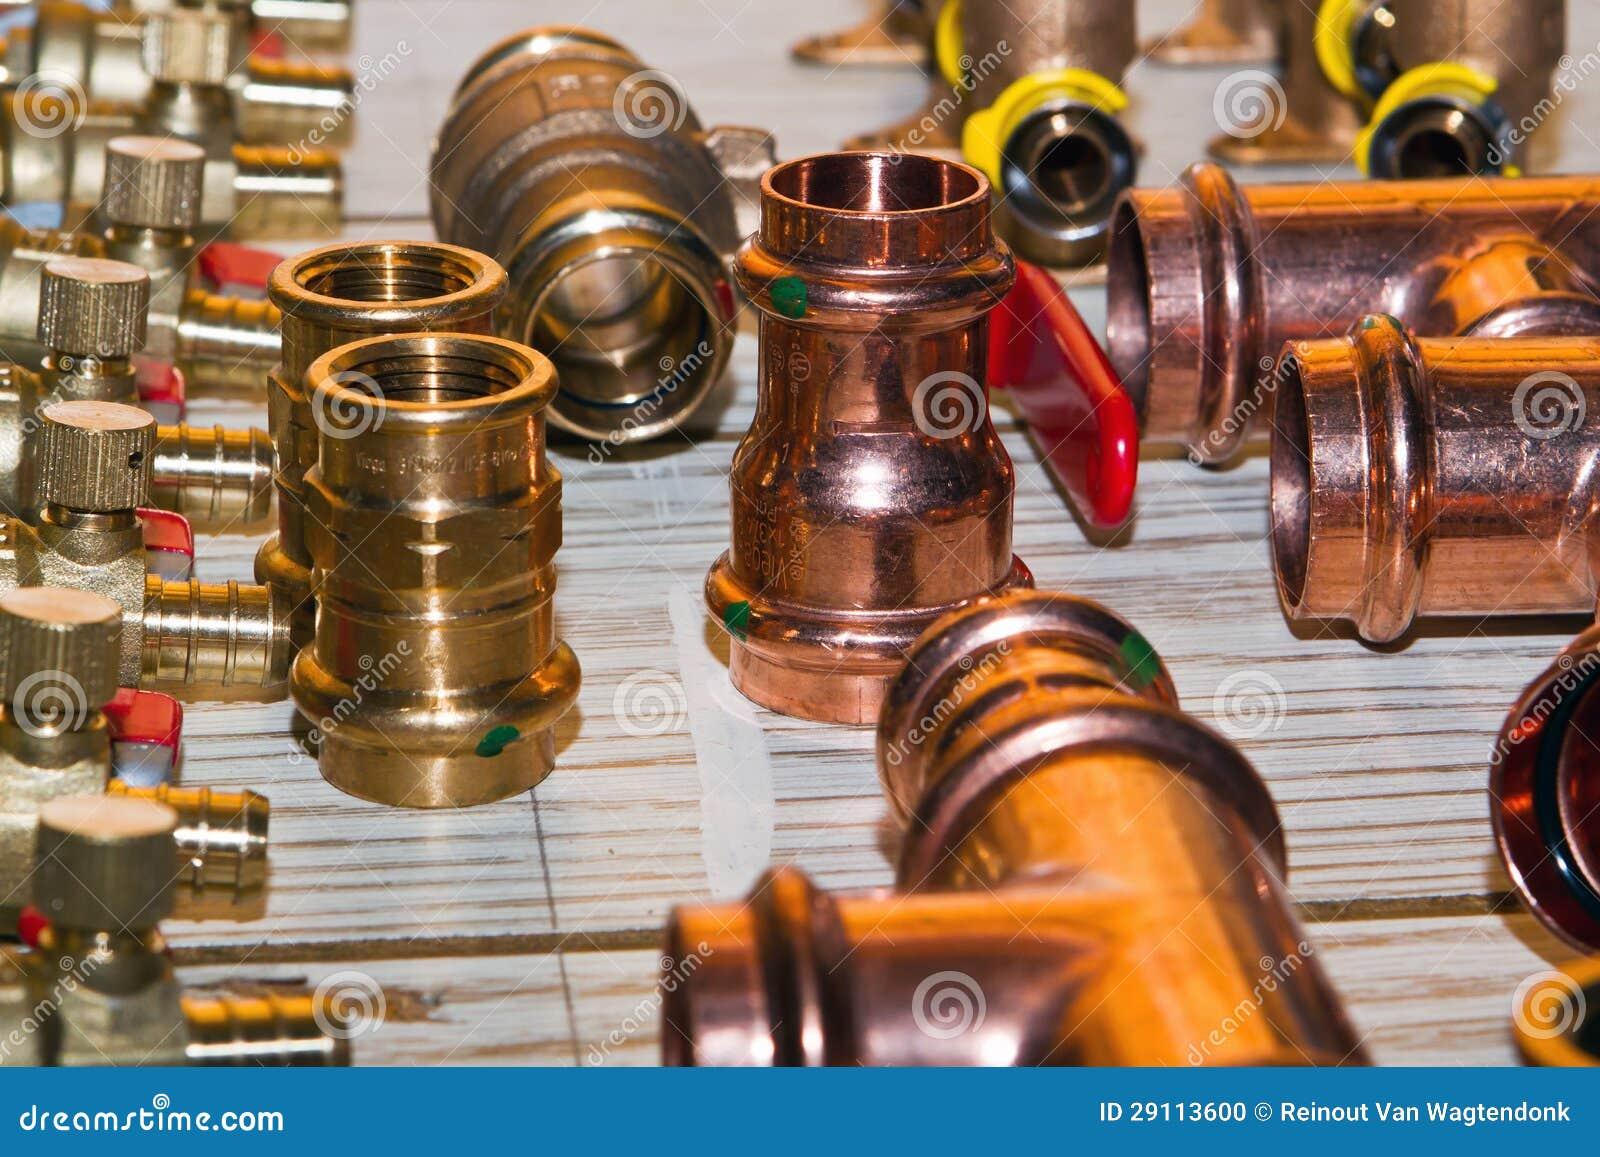 Plumbing supplies stock photo  Image of neat, adapters